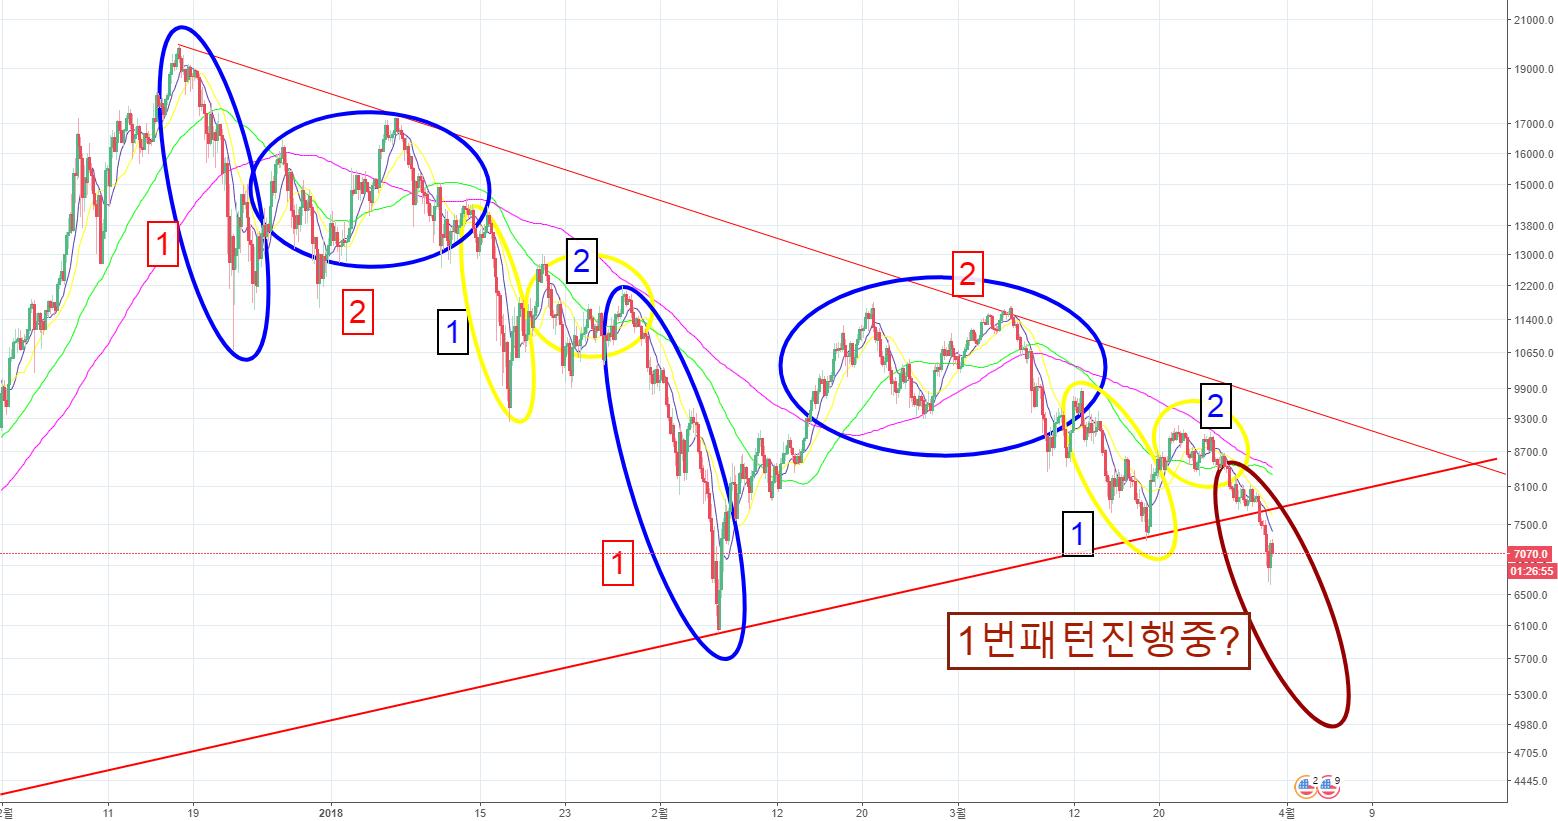 BTCUSD/ Bitcoin / 비트코인 / 또다시 반복되고있는 하락패턴(패턴을통한 4월예상흐름)(하락은끝은어디?)